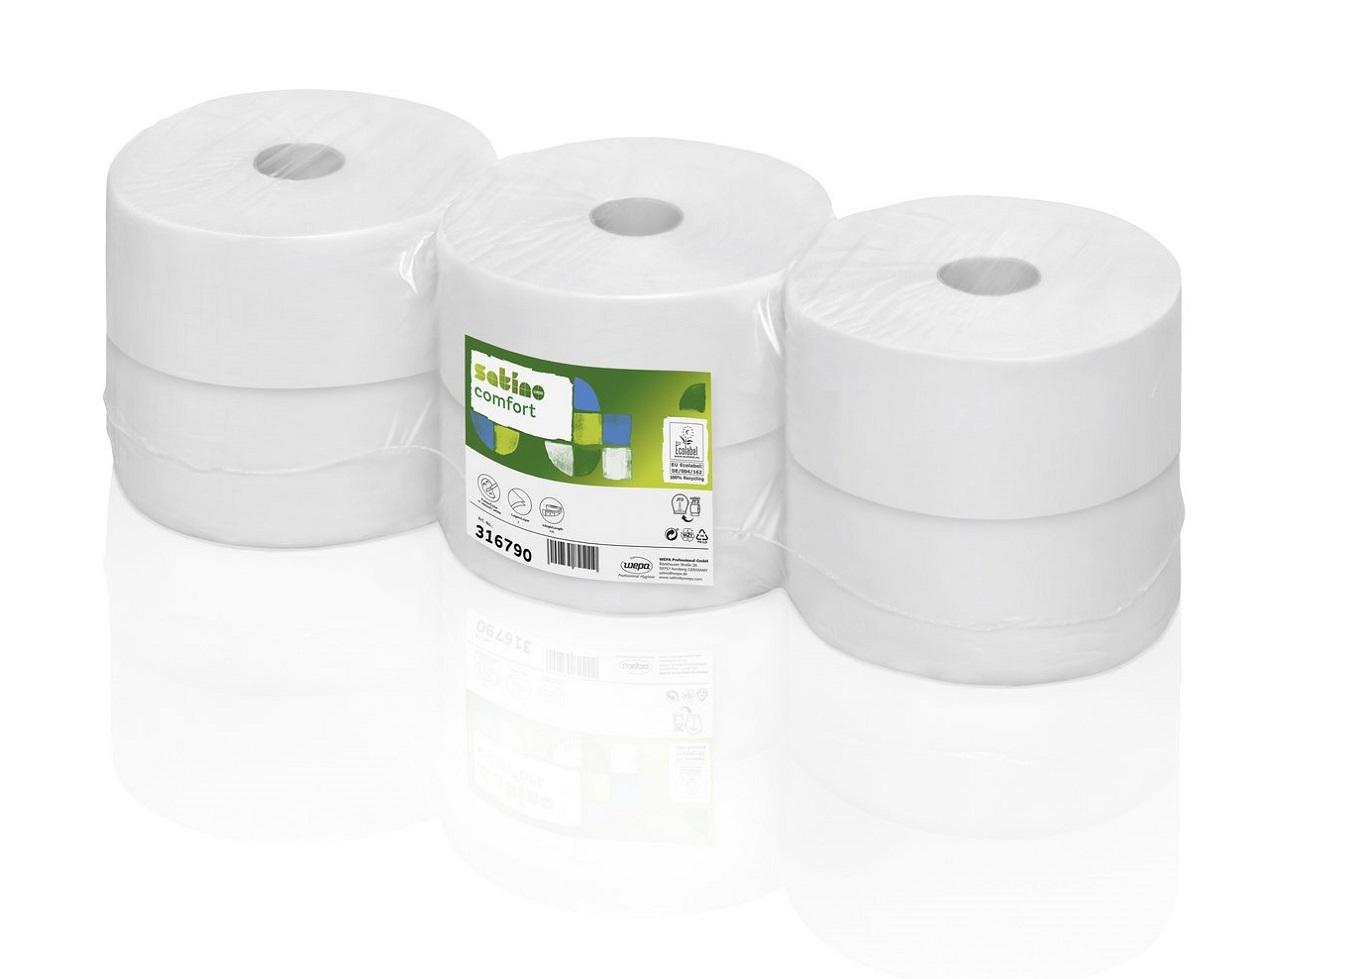 papier toaletowy jt2 jumbo big rola pureco.pl